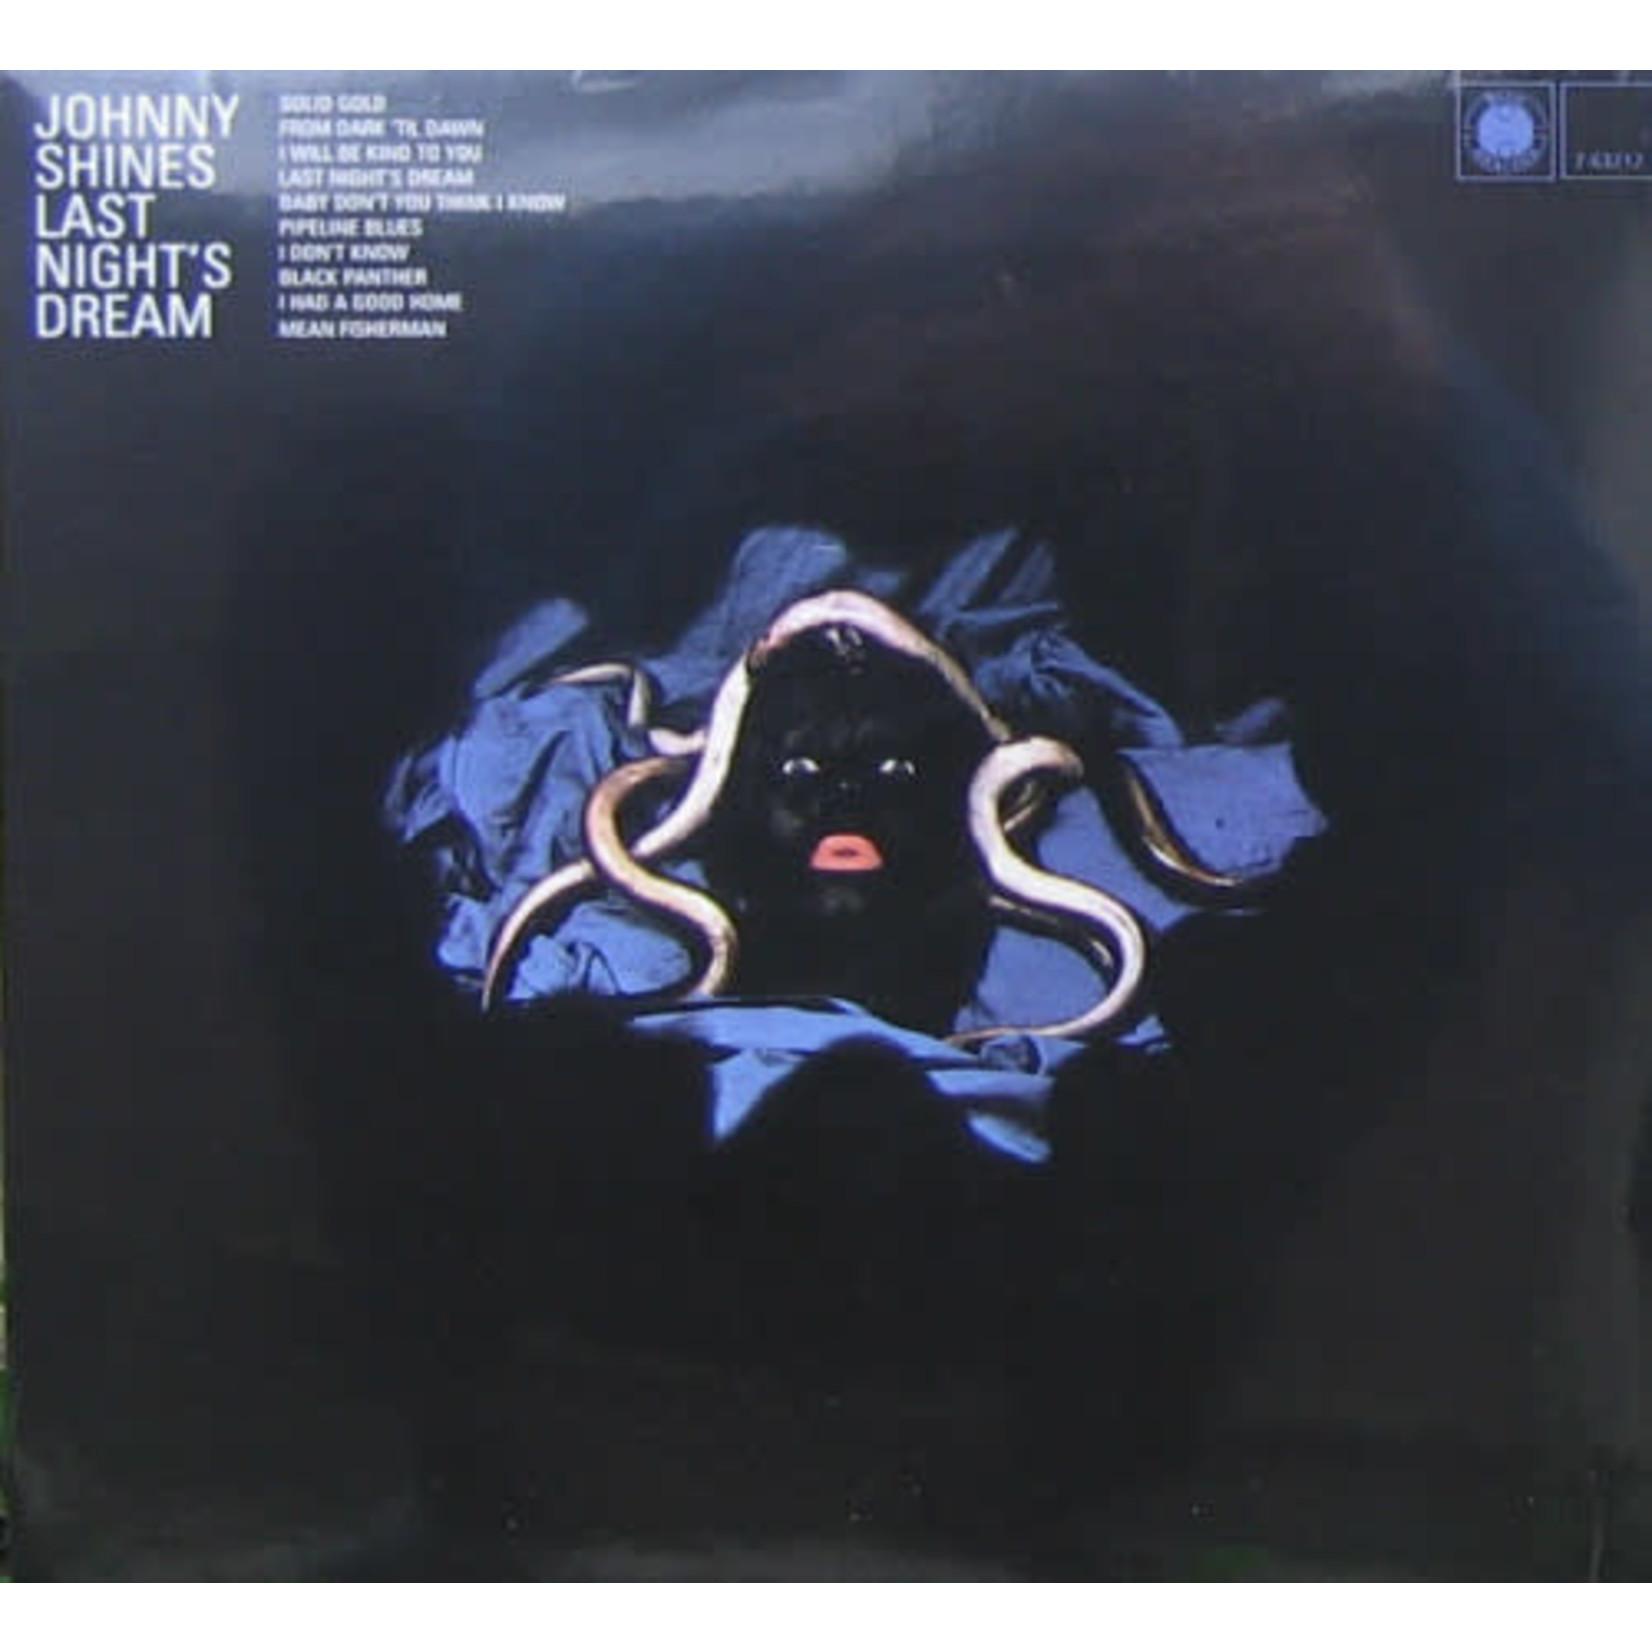 JOHNNY SHINES LAST NIGHT'S DREAM